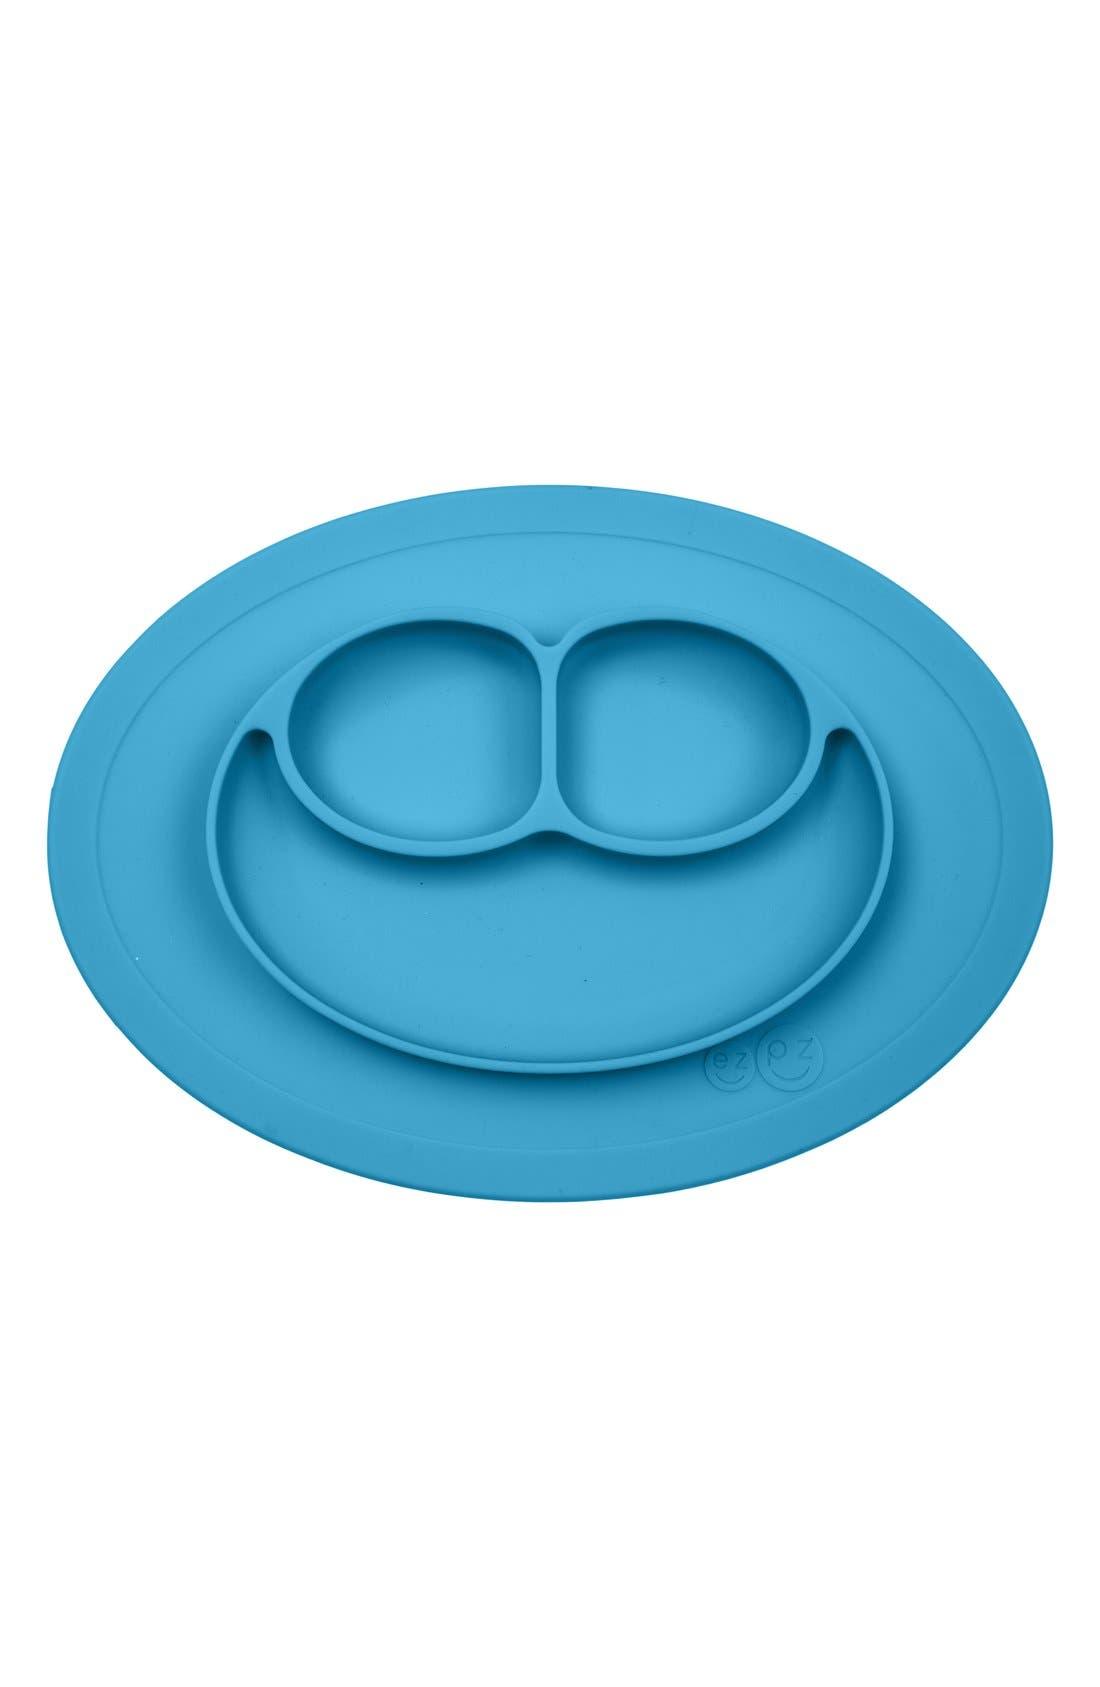 Main Image - ezpz 'Mini Mat' Silicone Feeding Mat